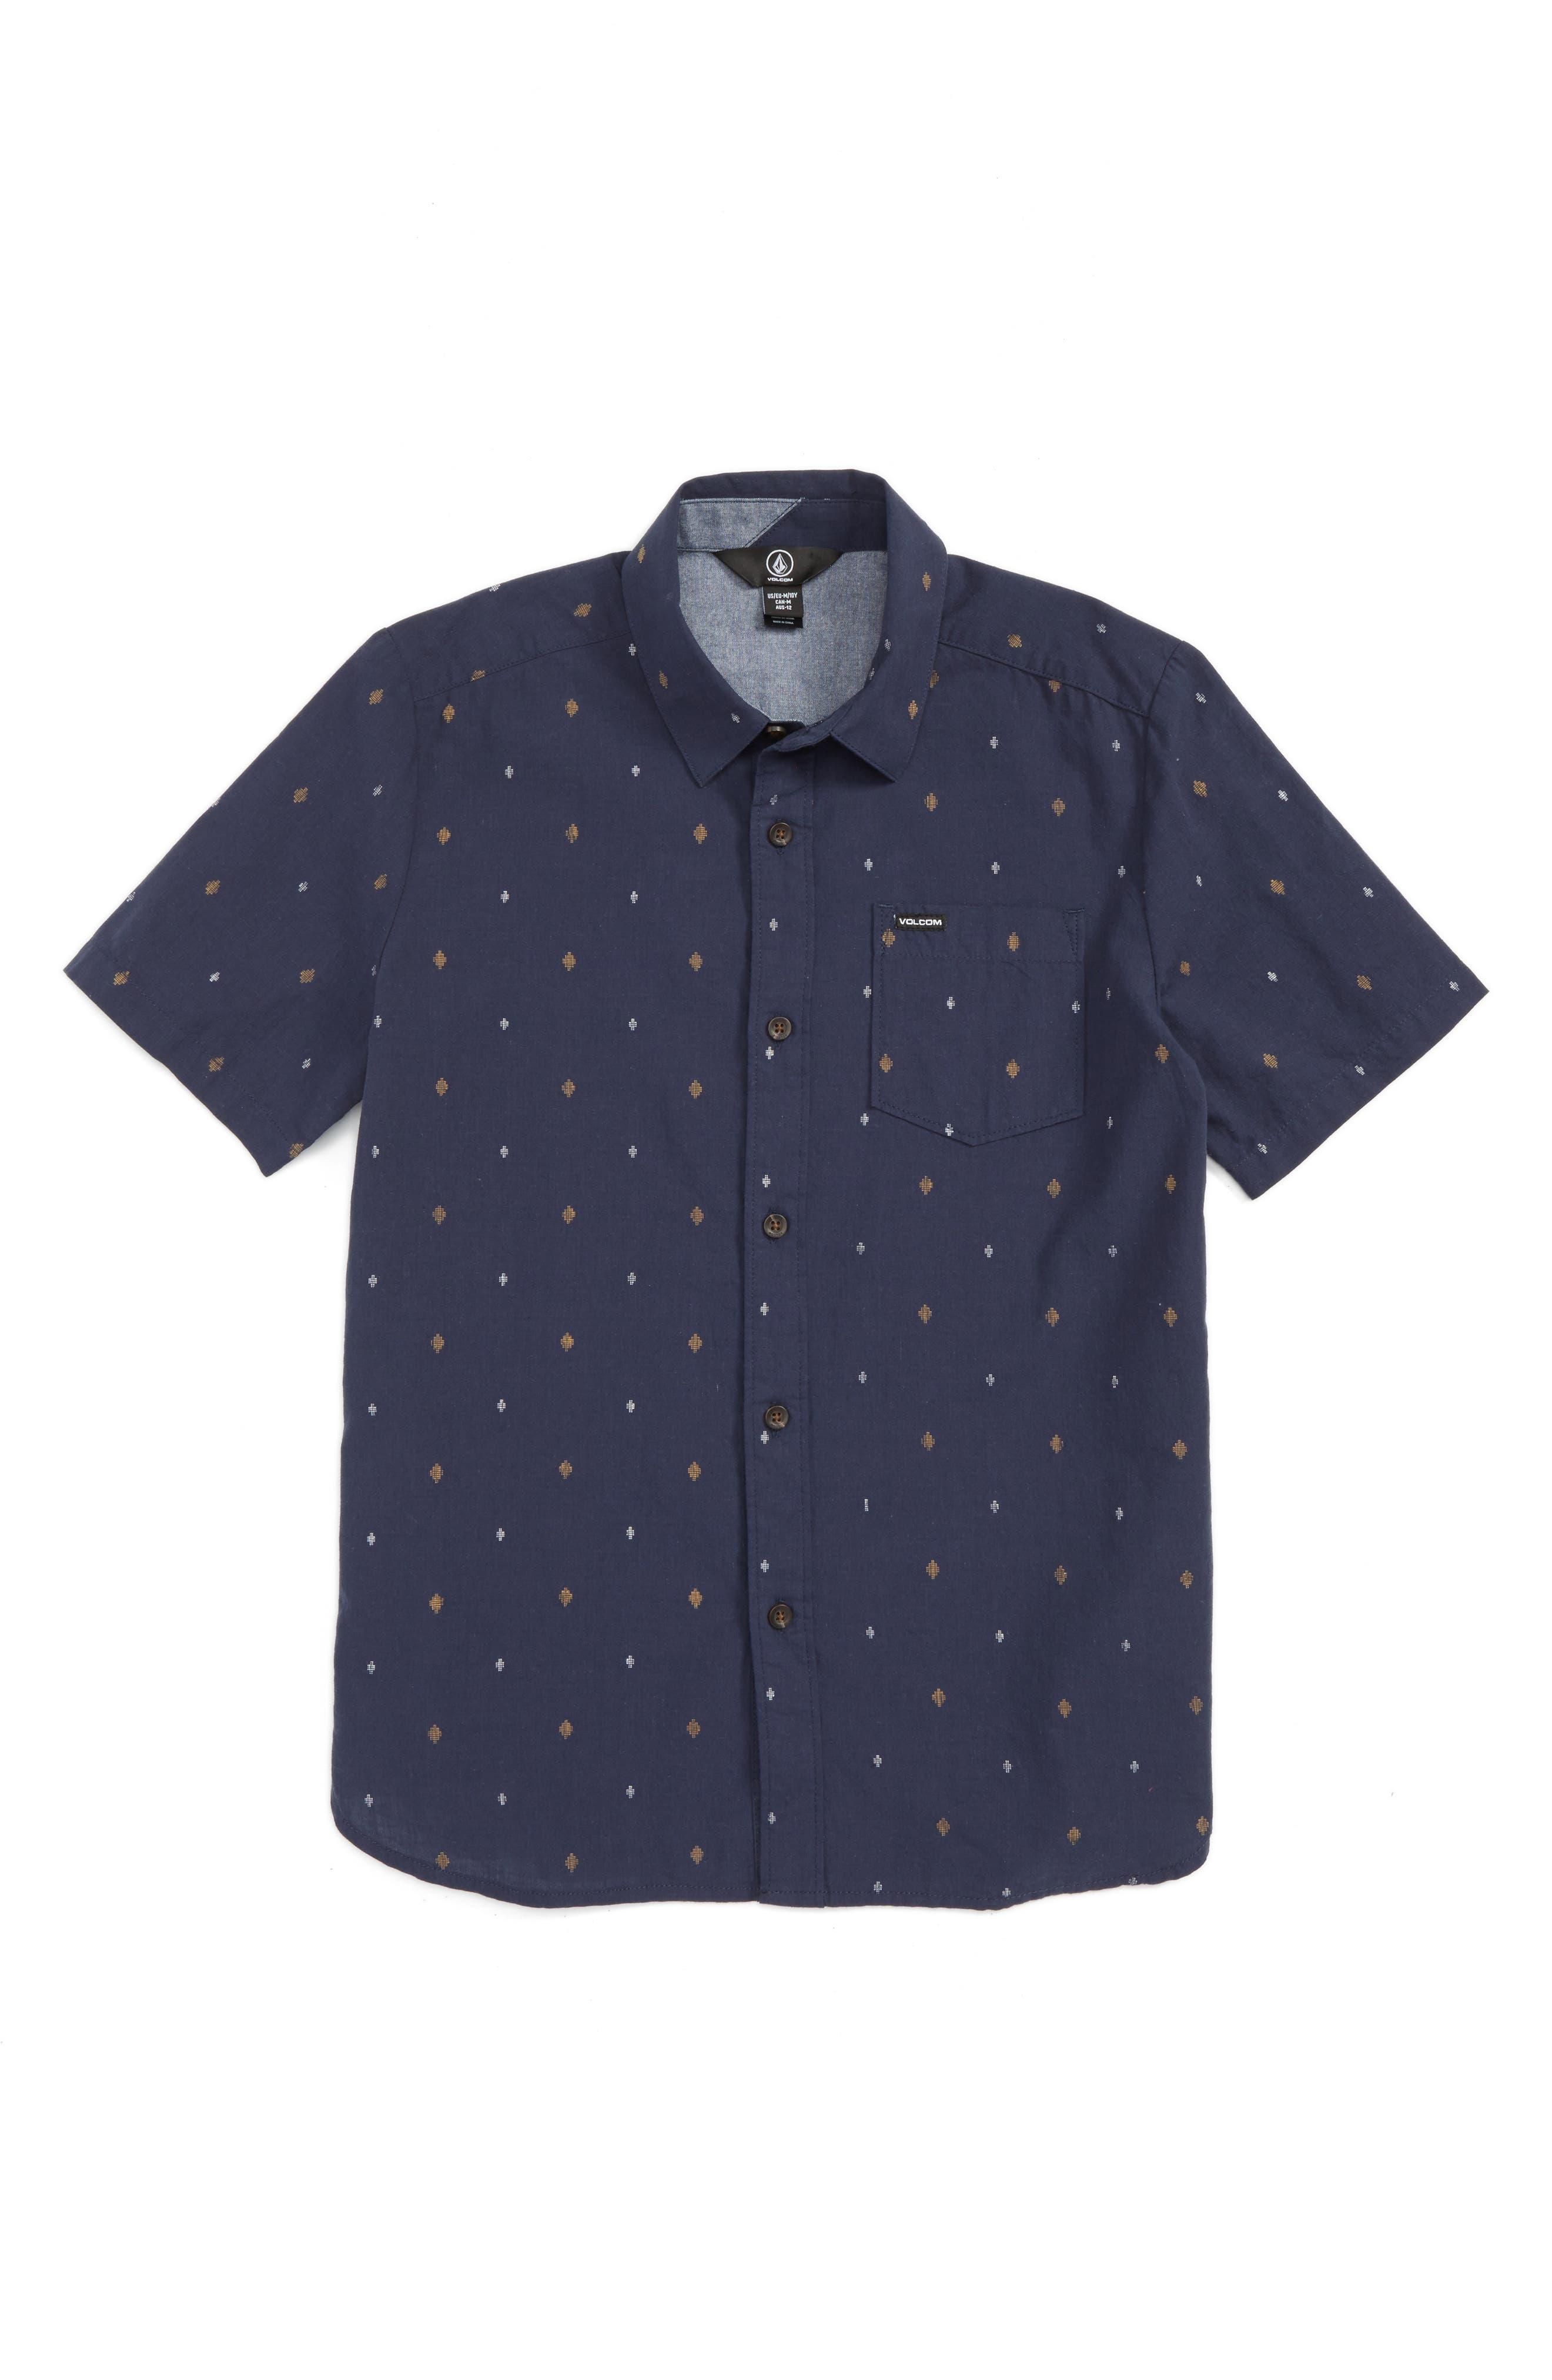 Main Image - Volcom Interlude Print Woven Shirt (Toddler Boys, Little Boys & Big Boys)